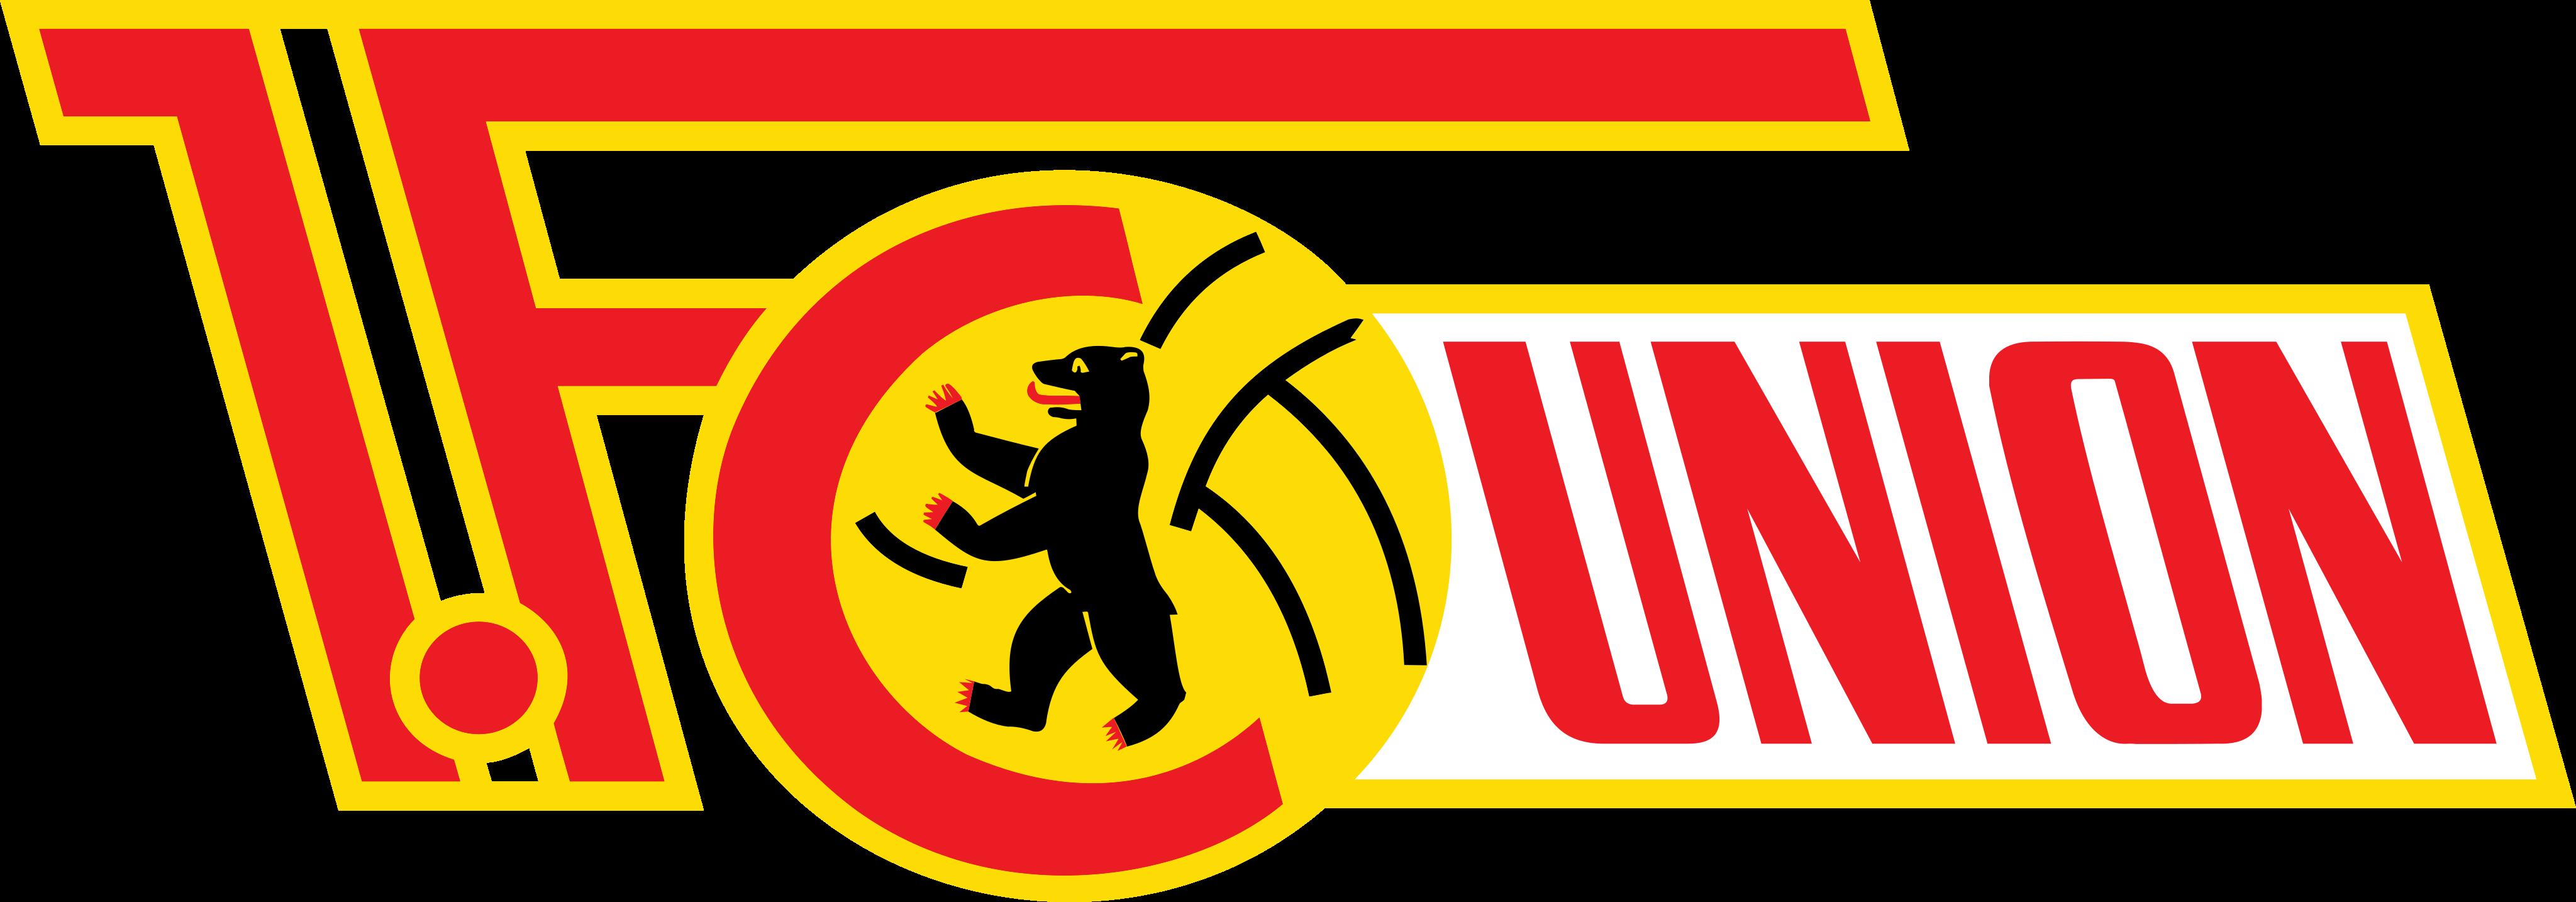 FC Union Berlin Logo.